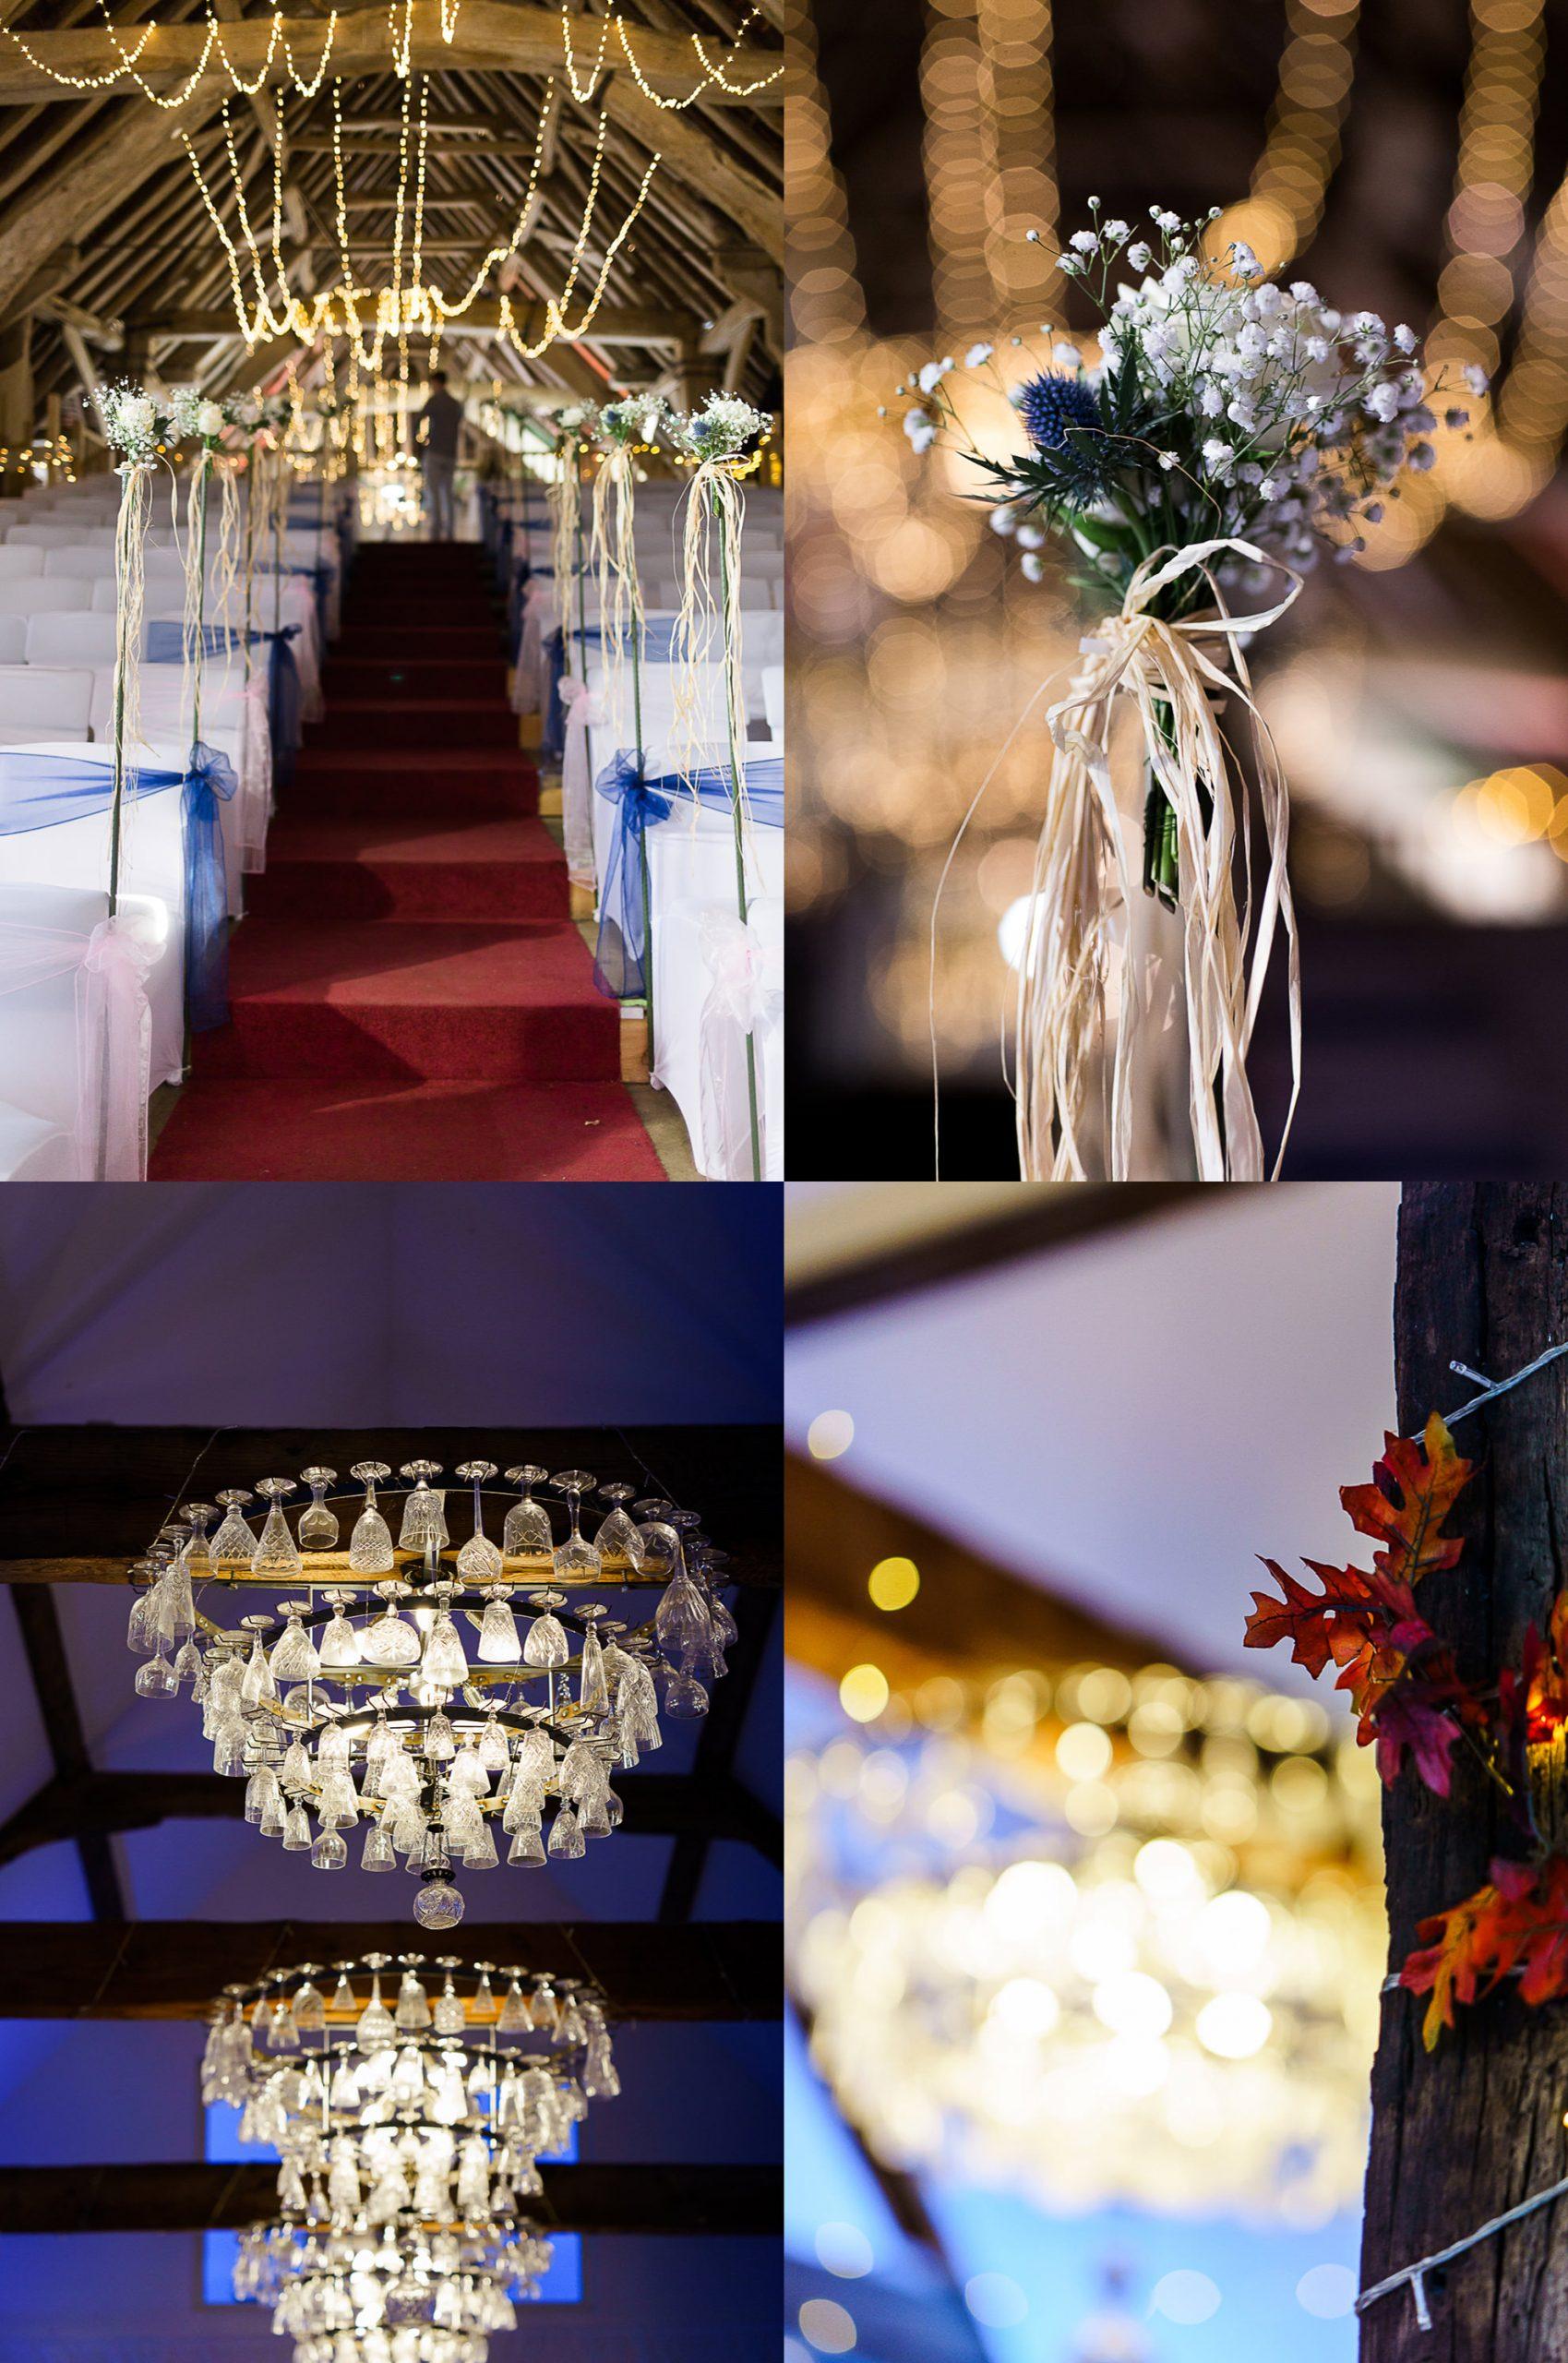 collage of details in titcfield barn wedding venue